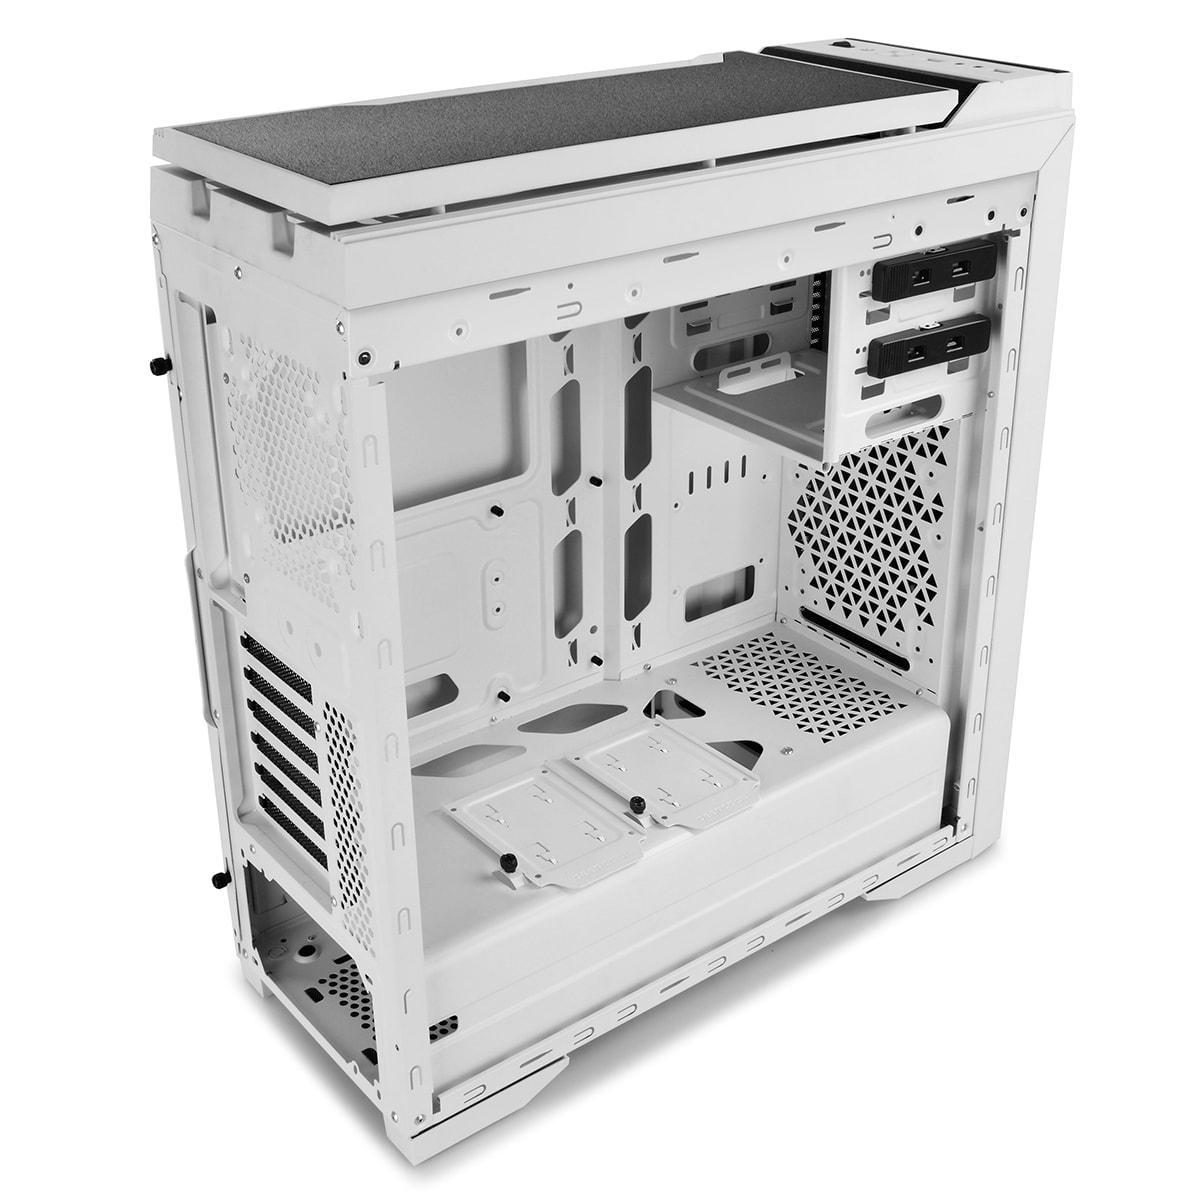 Deepcool mT/Ss Alim/ATX Blanc - Boîtier PC Deepcool - Cybertek.fr - 3